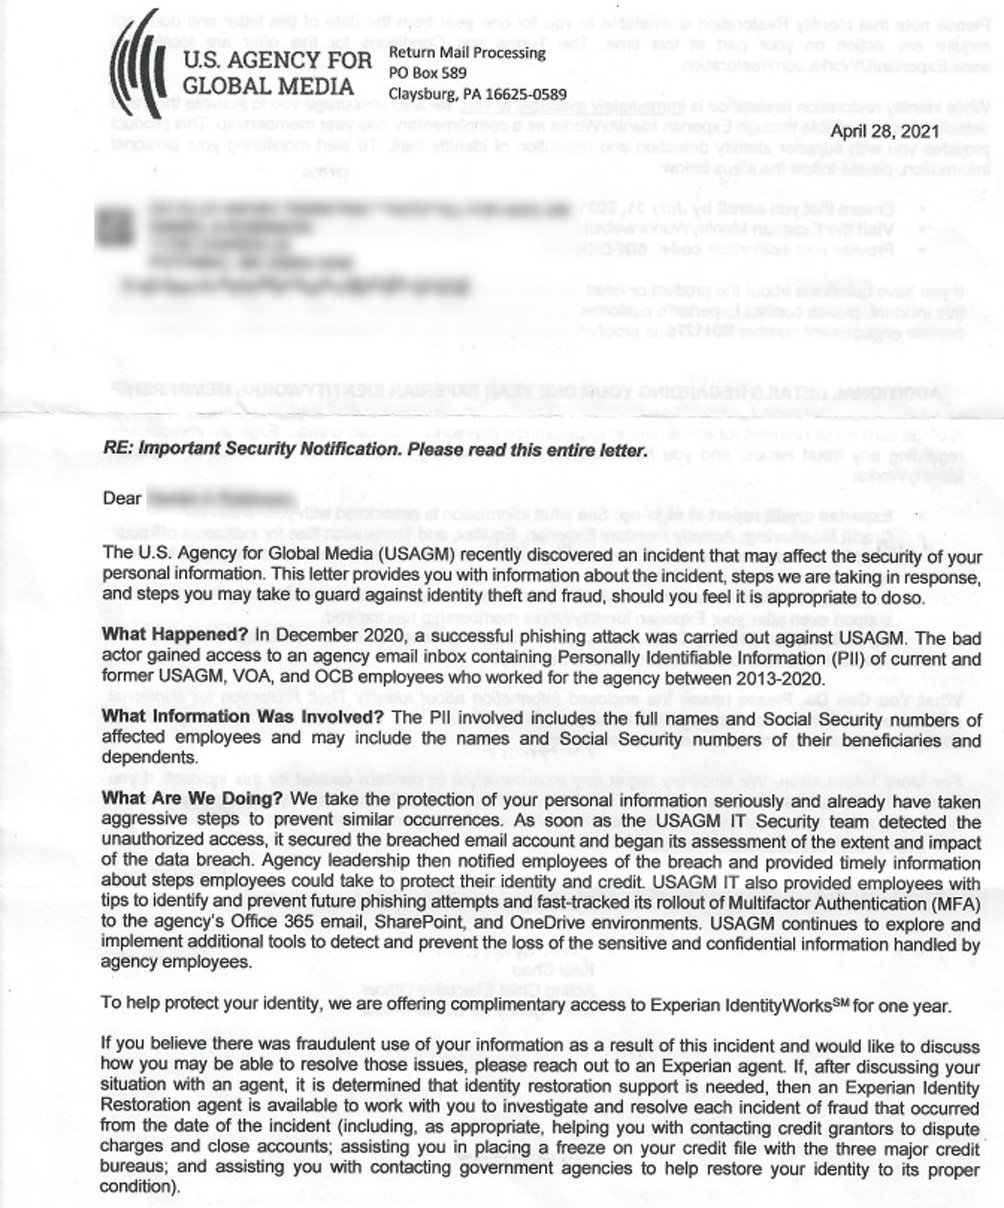 Data breach notification sent by USAGM